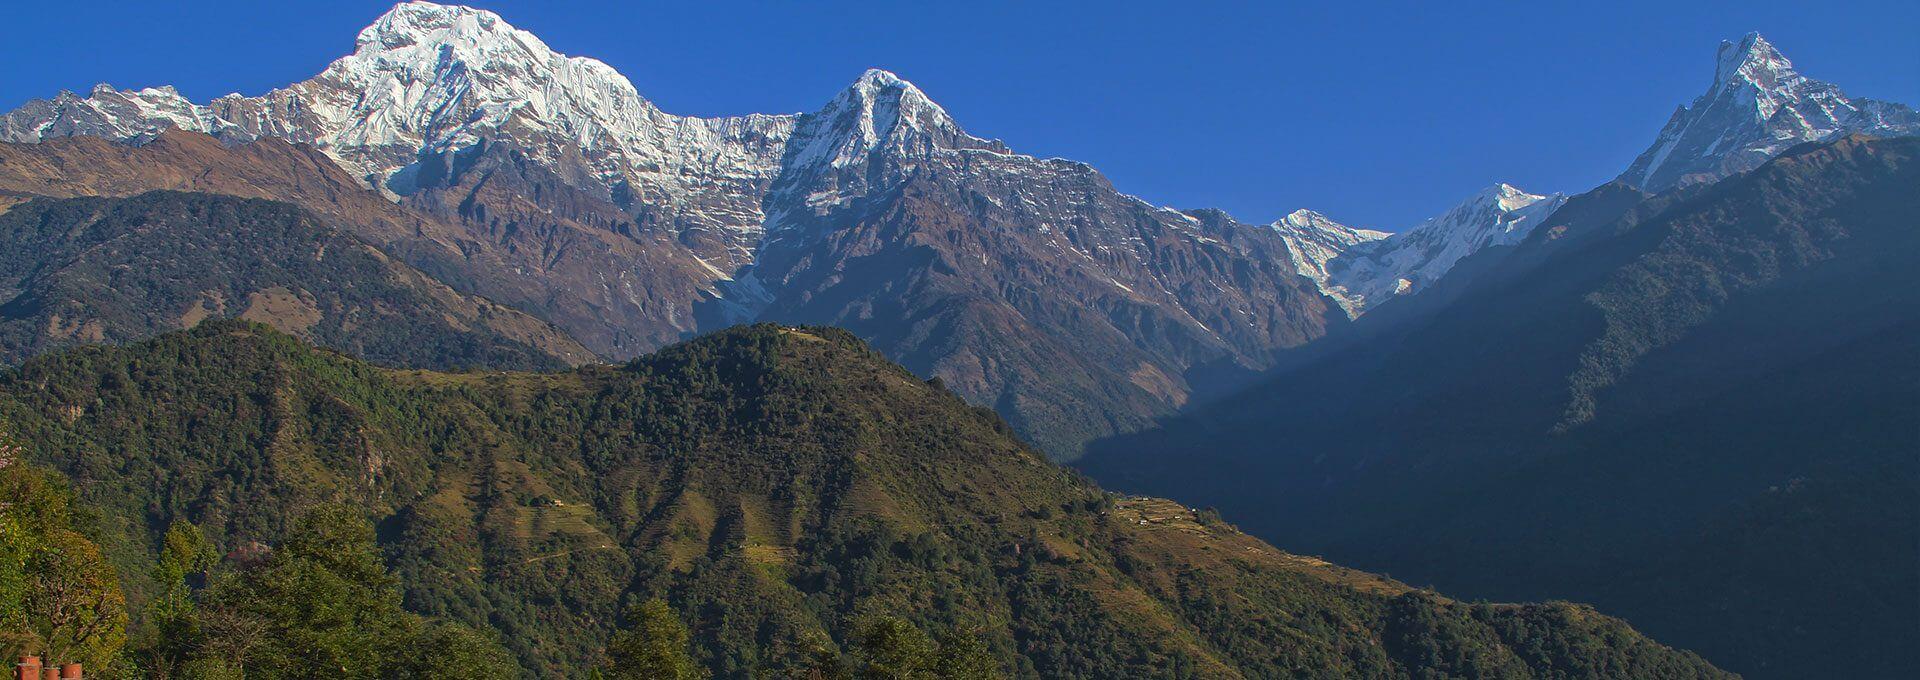 Himalayas on Foot